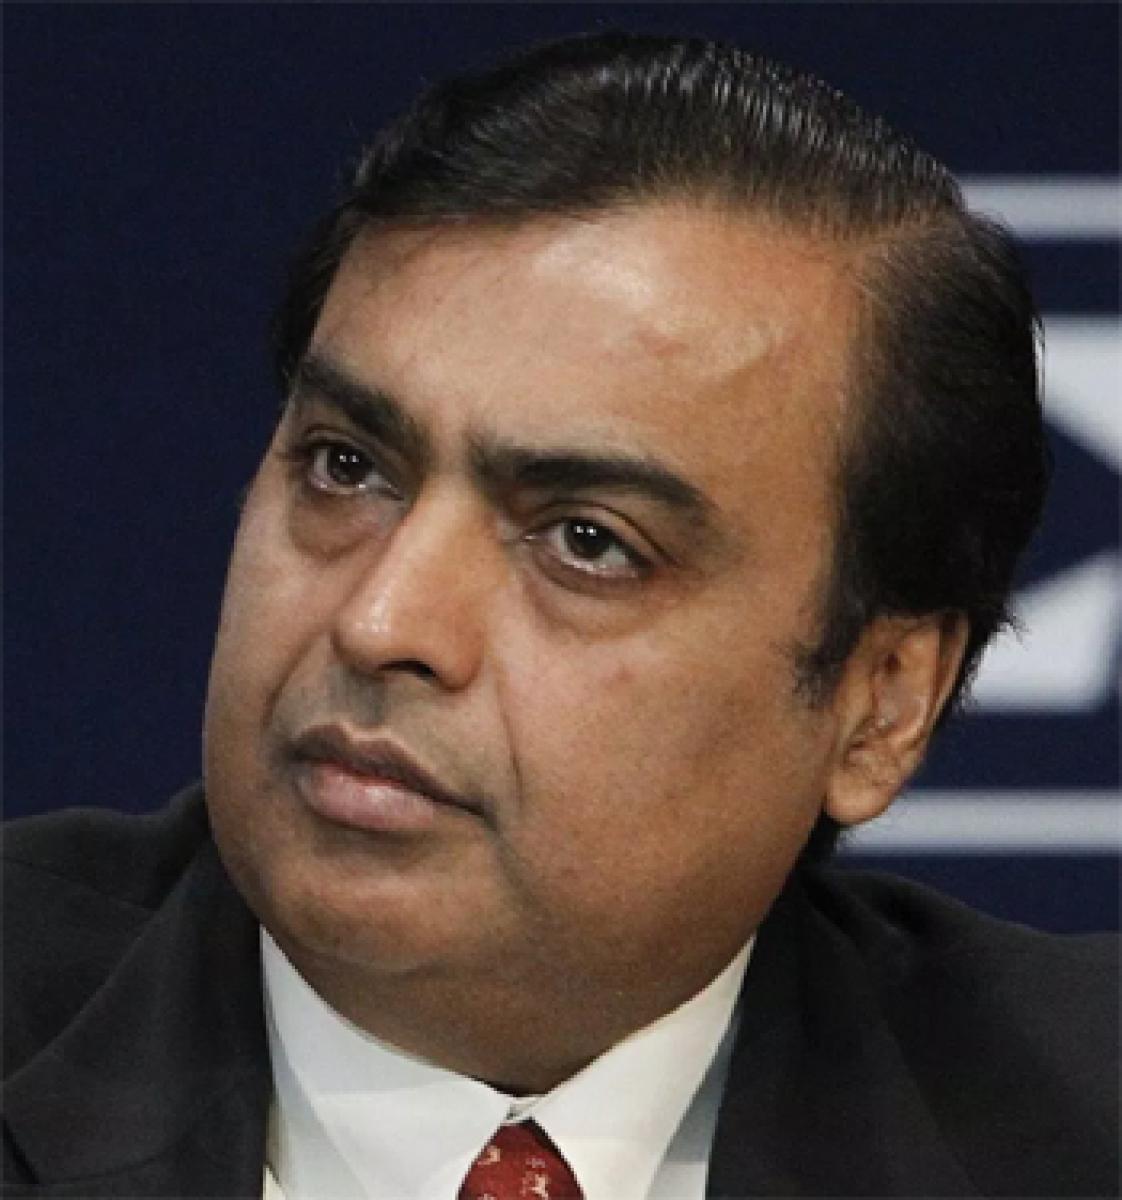 Jioll rank India among top 10 nations in digital world: Ambani